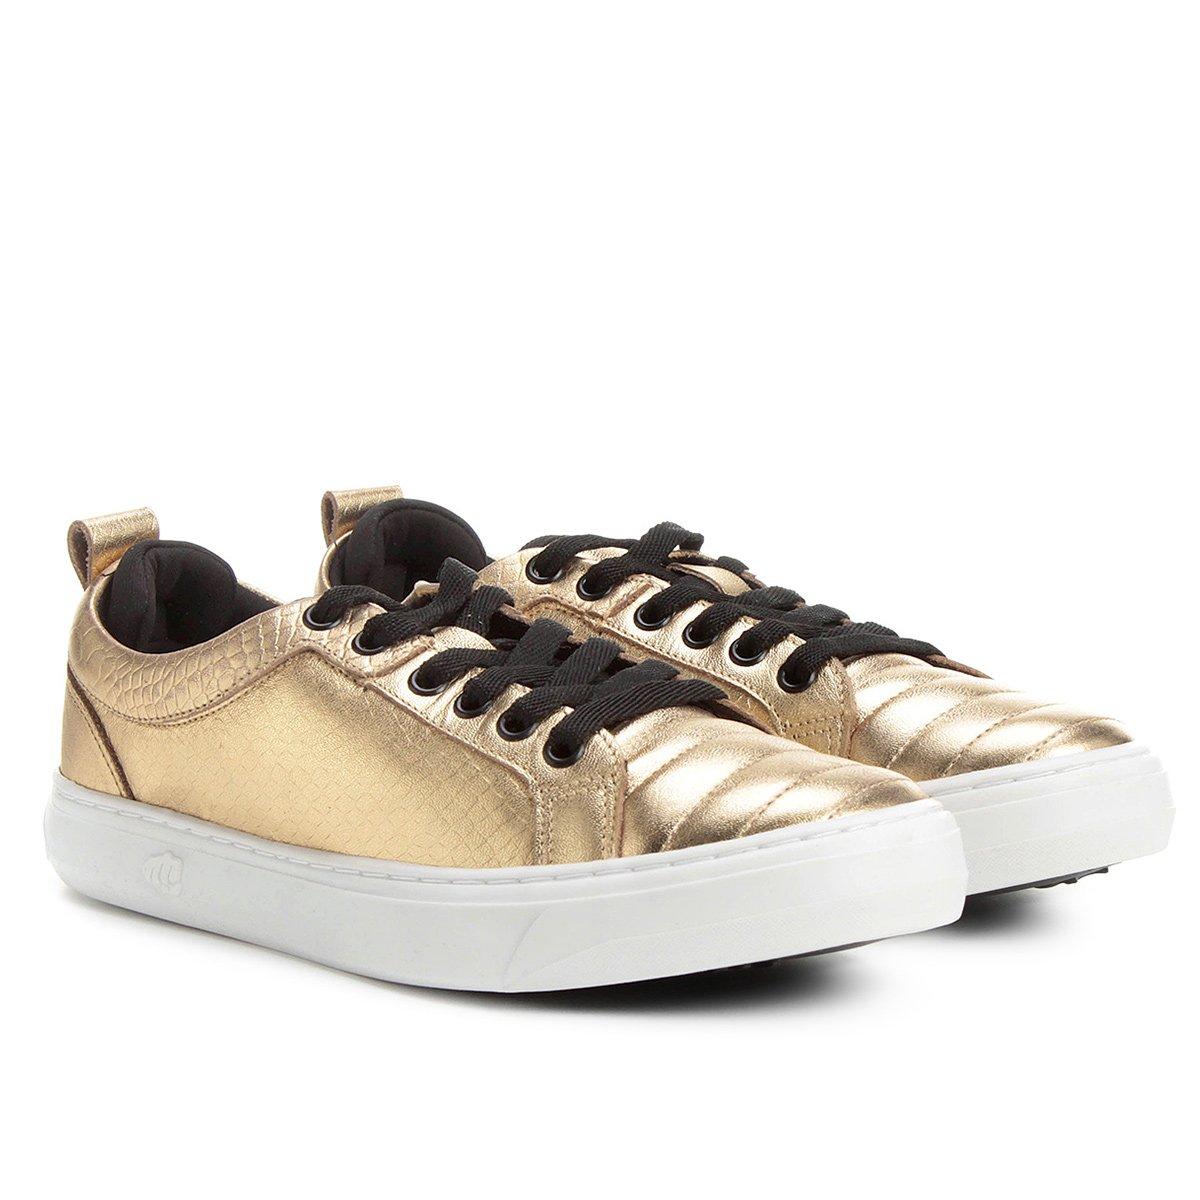 Cadarço Footwear Footwear Hardcore Tênis Tênis Hardcore Dourado xB1qXaqnw